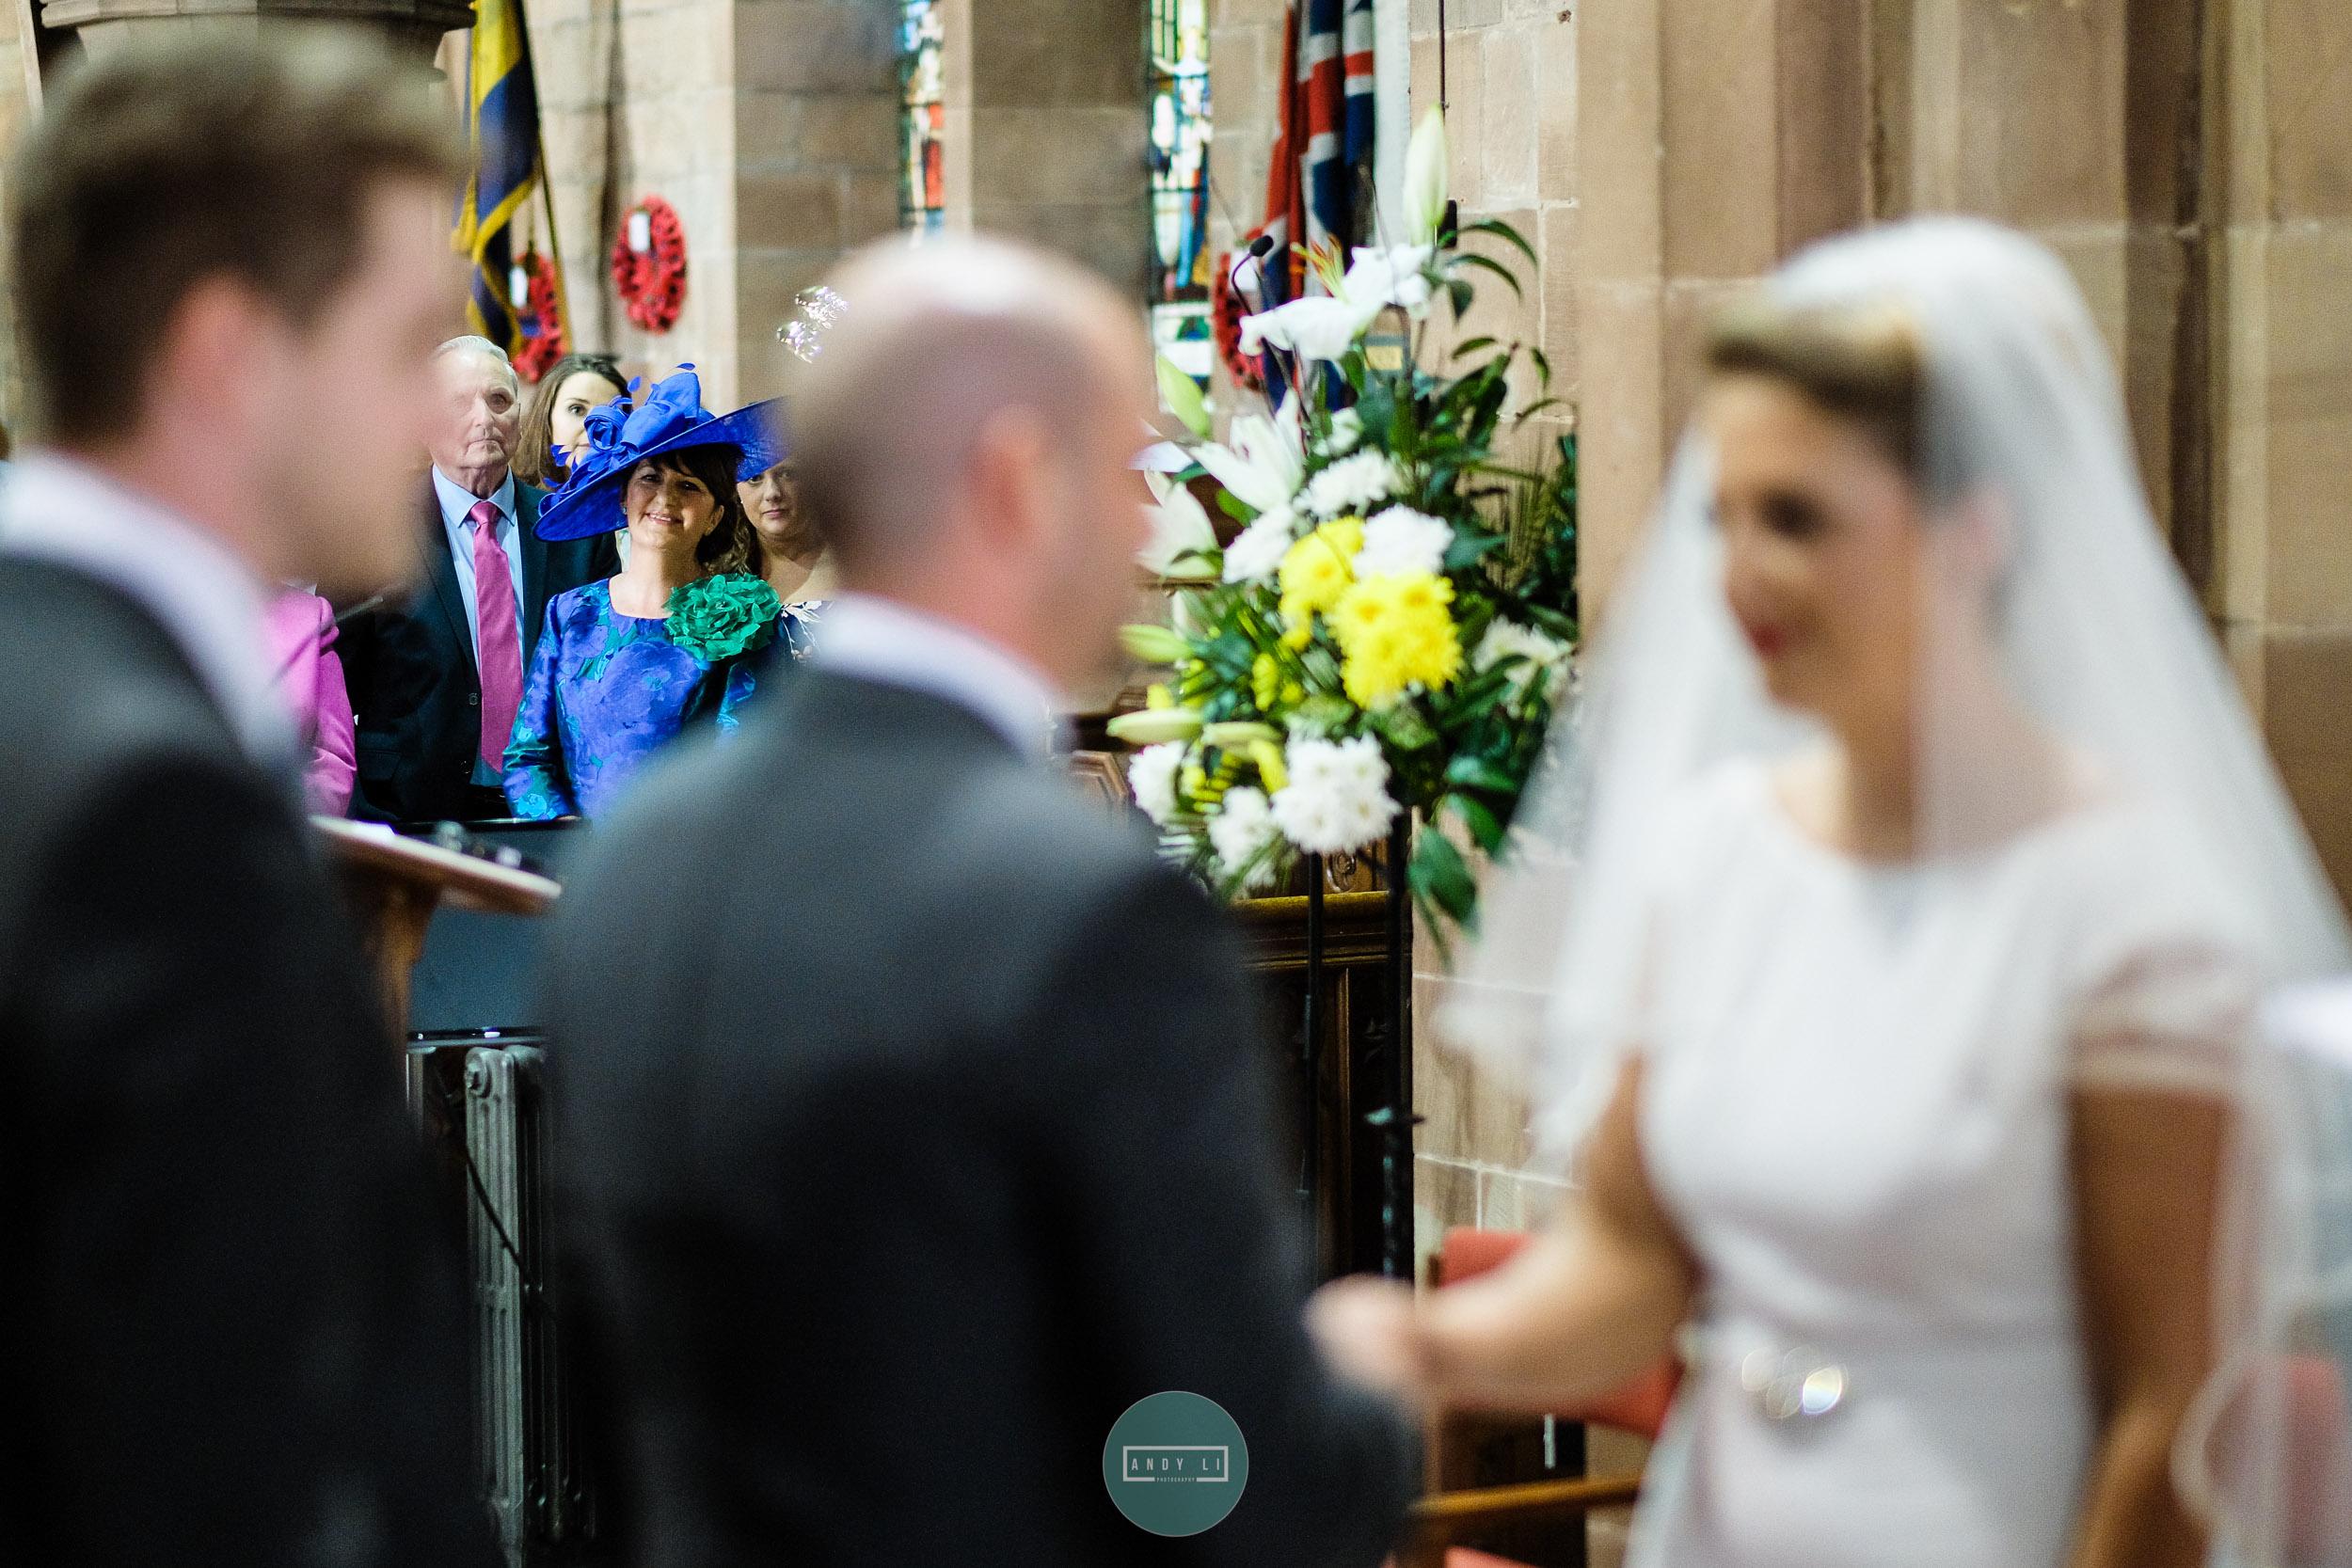 Lilleshall Hall Wedding Photographer-030-AXT21613.jpg